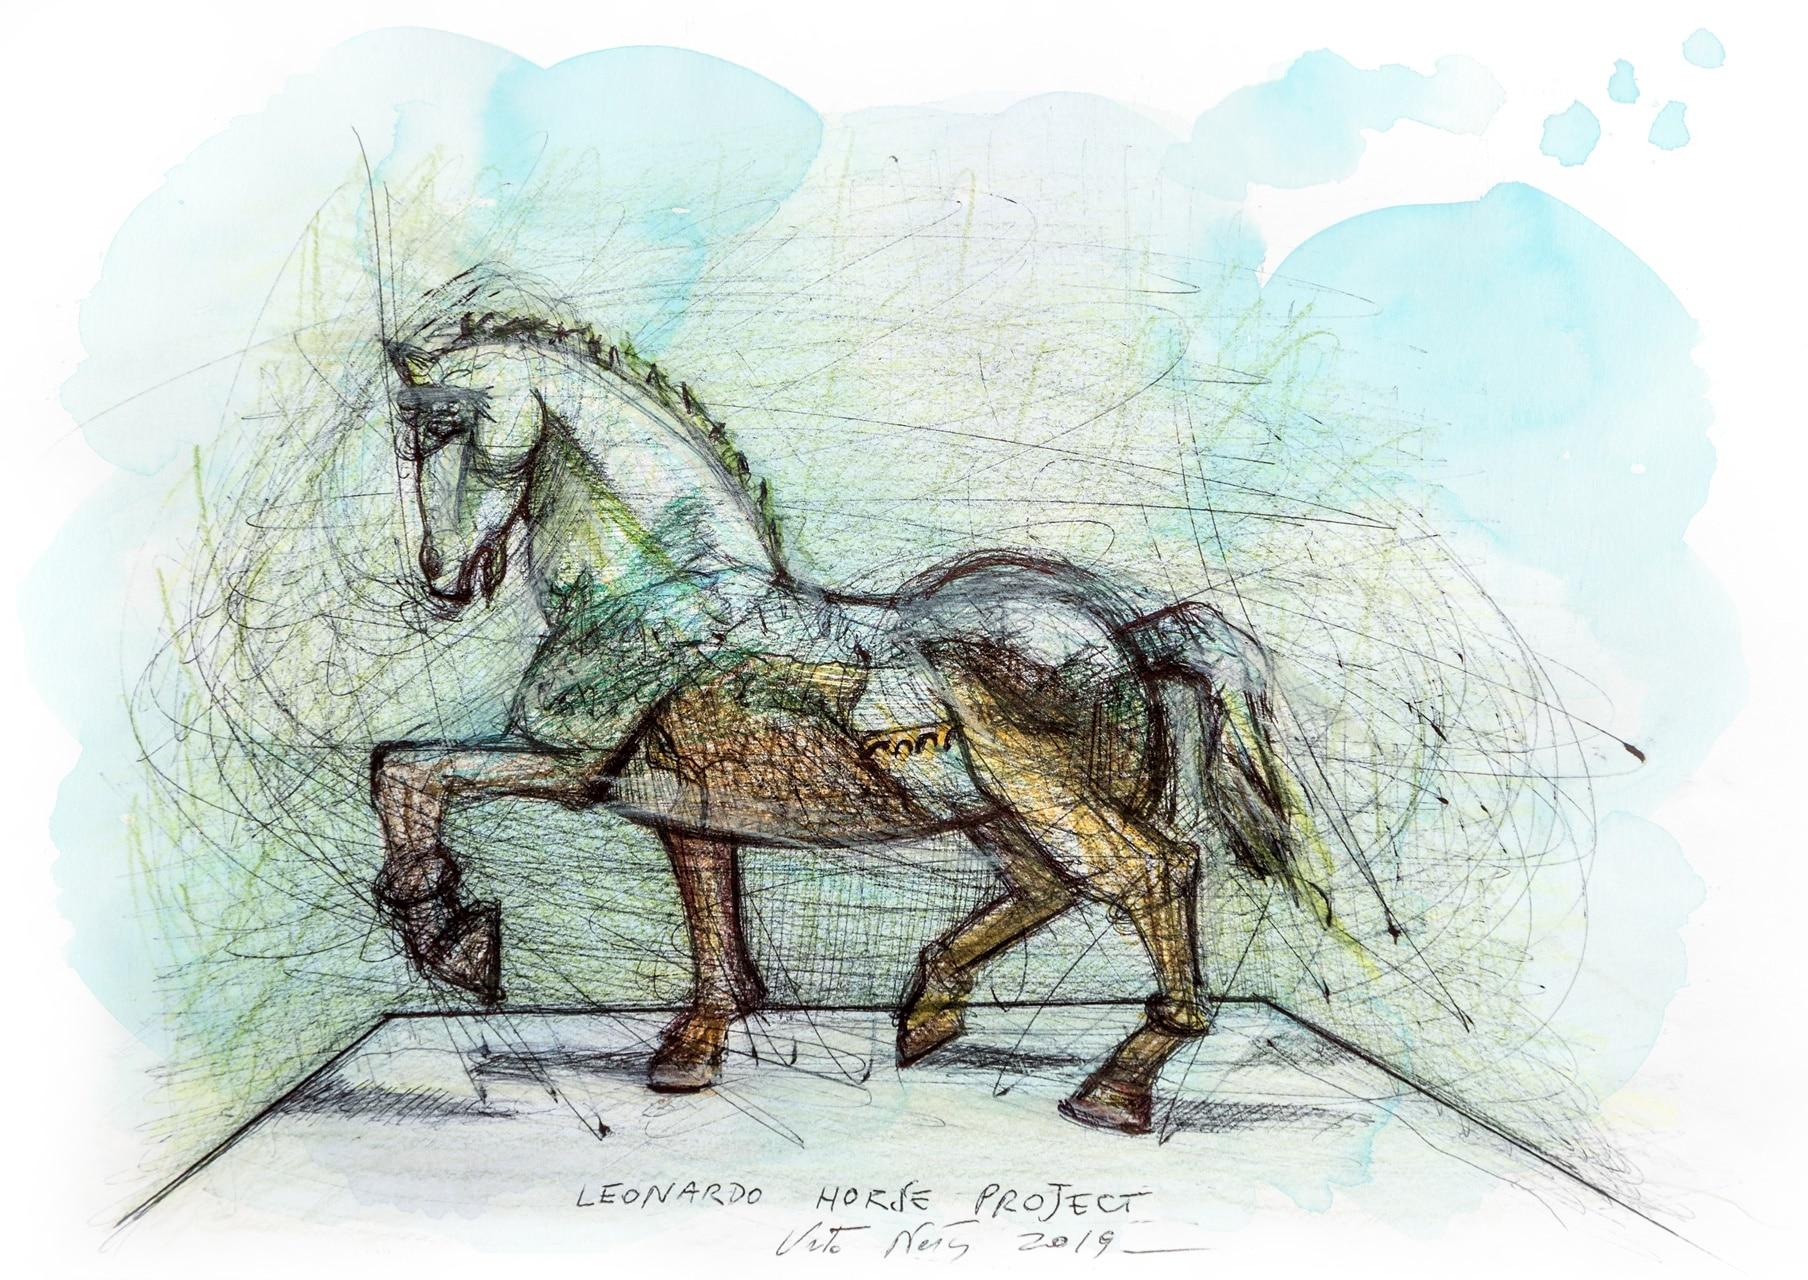 Leonardo Horse Project | Porto Cervo ospita il genio di Leonardo